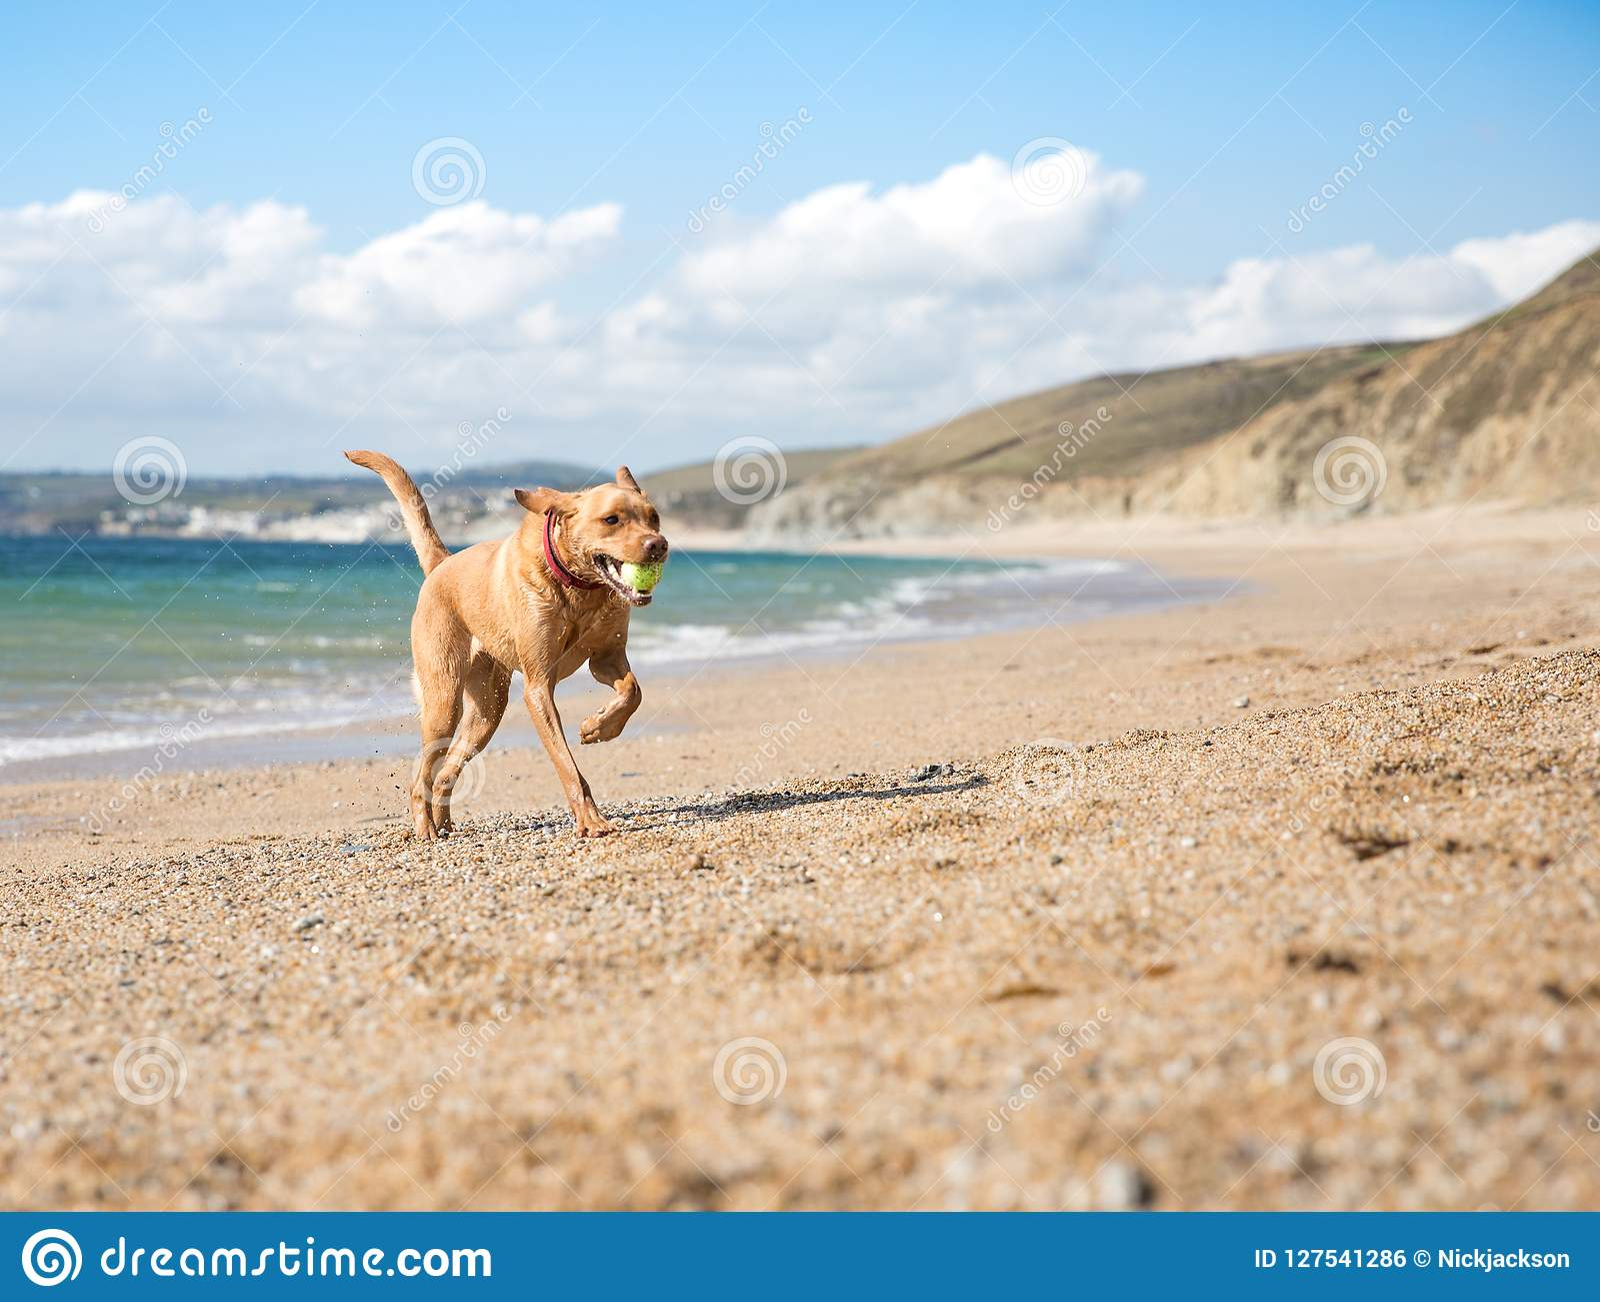 Yellow Labrador retriever dog playing fetch on a sandy beach